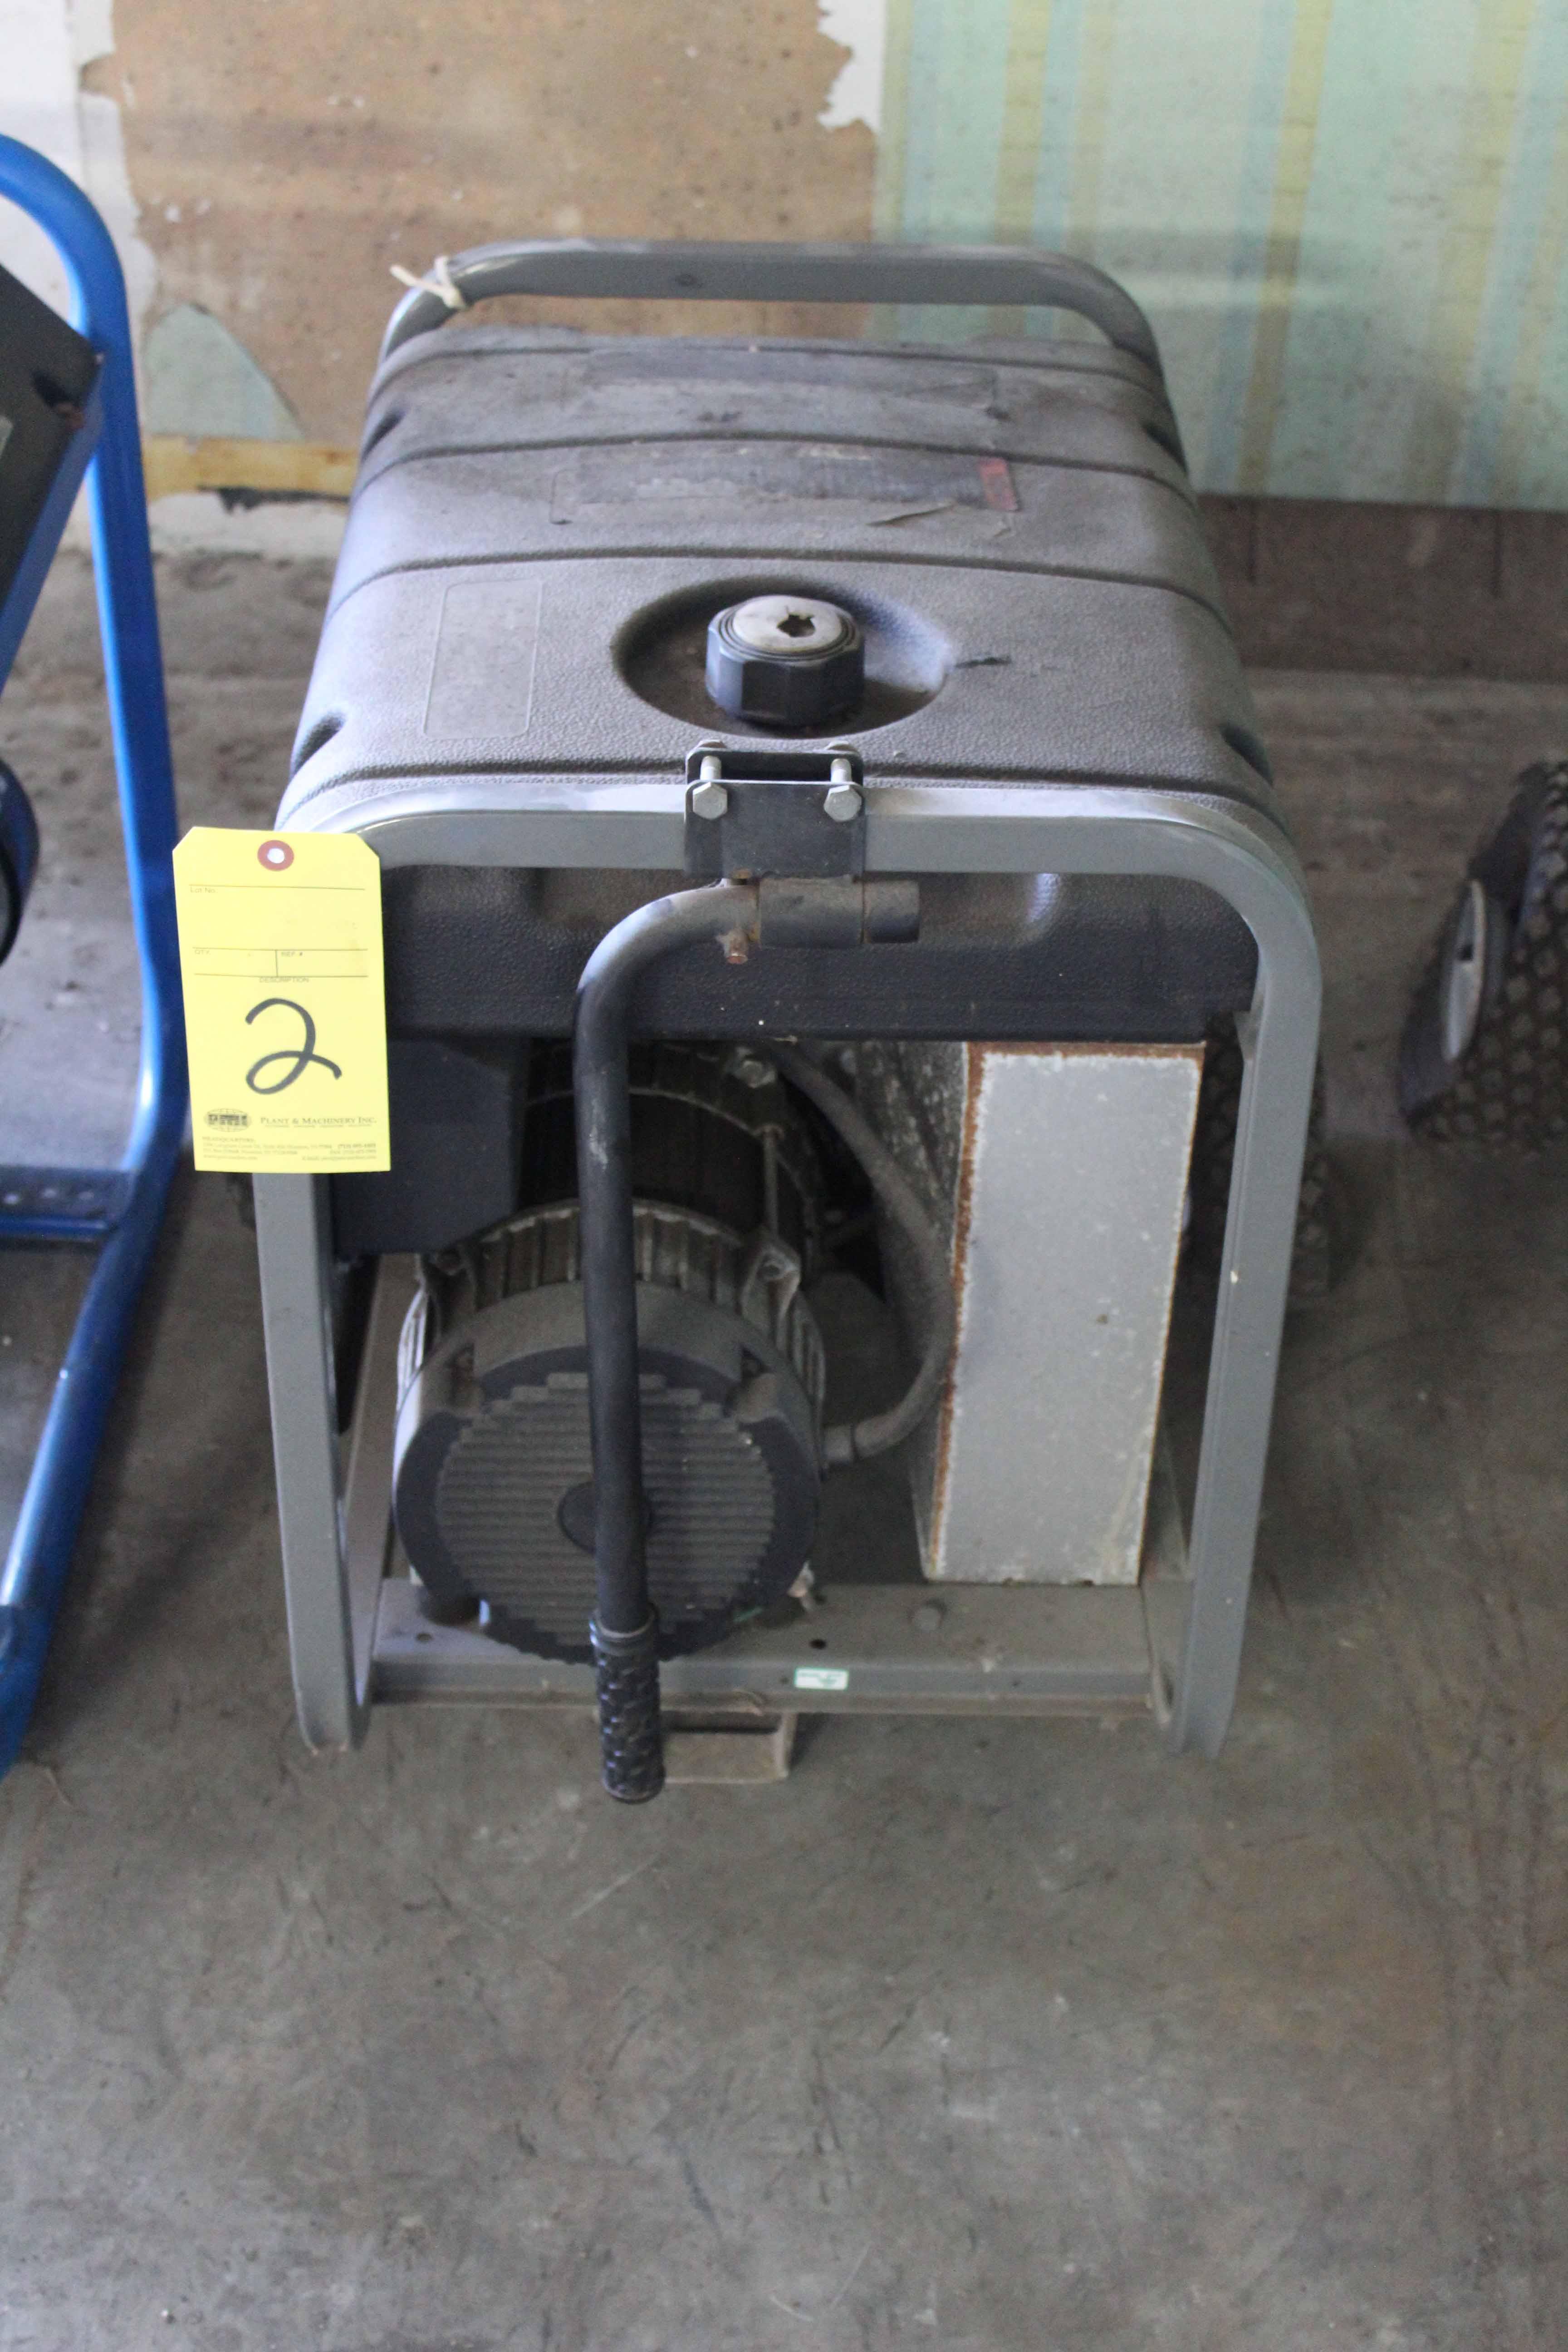 Lot 2 - PORTABLE GENERATOR, BRIGGS & STRATTON, 5,550 watt, gasoline pwrd.